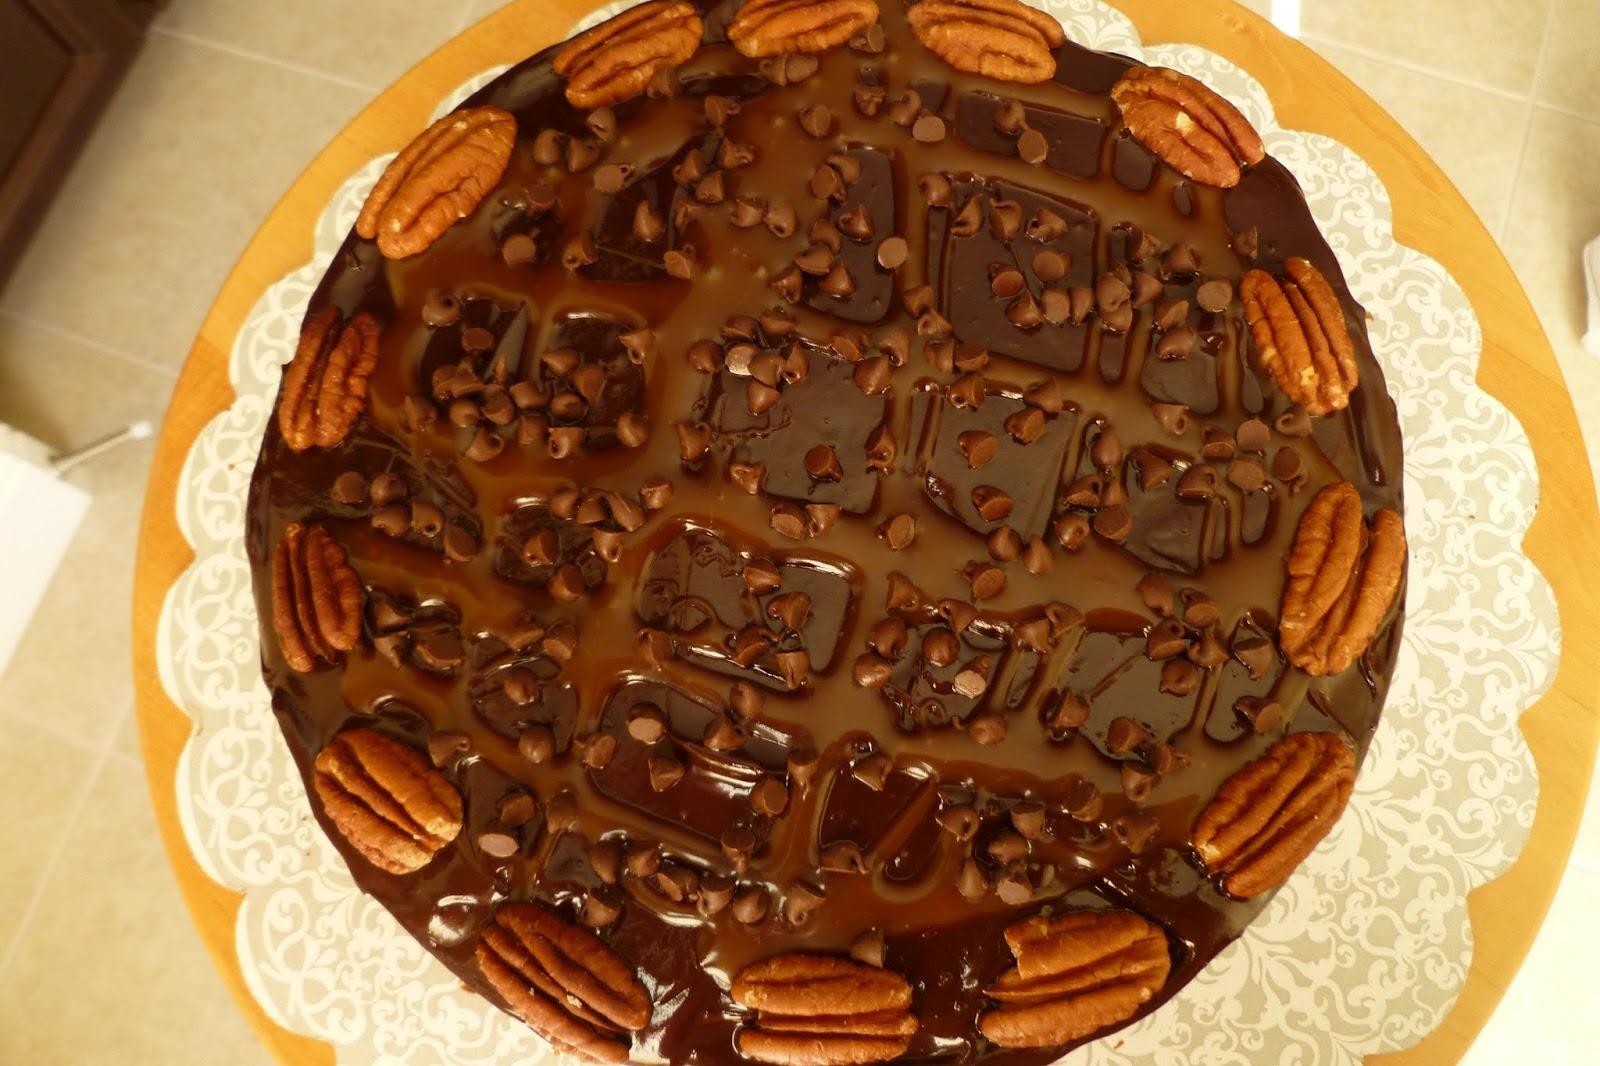 Крем для торта черепаха рецепт в домашних условиях